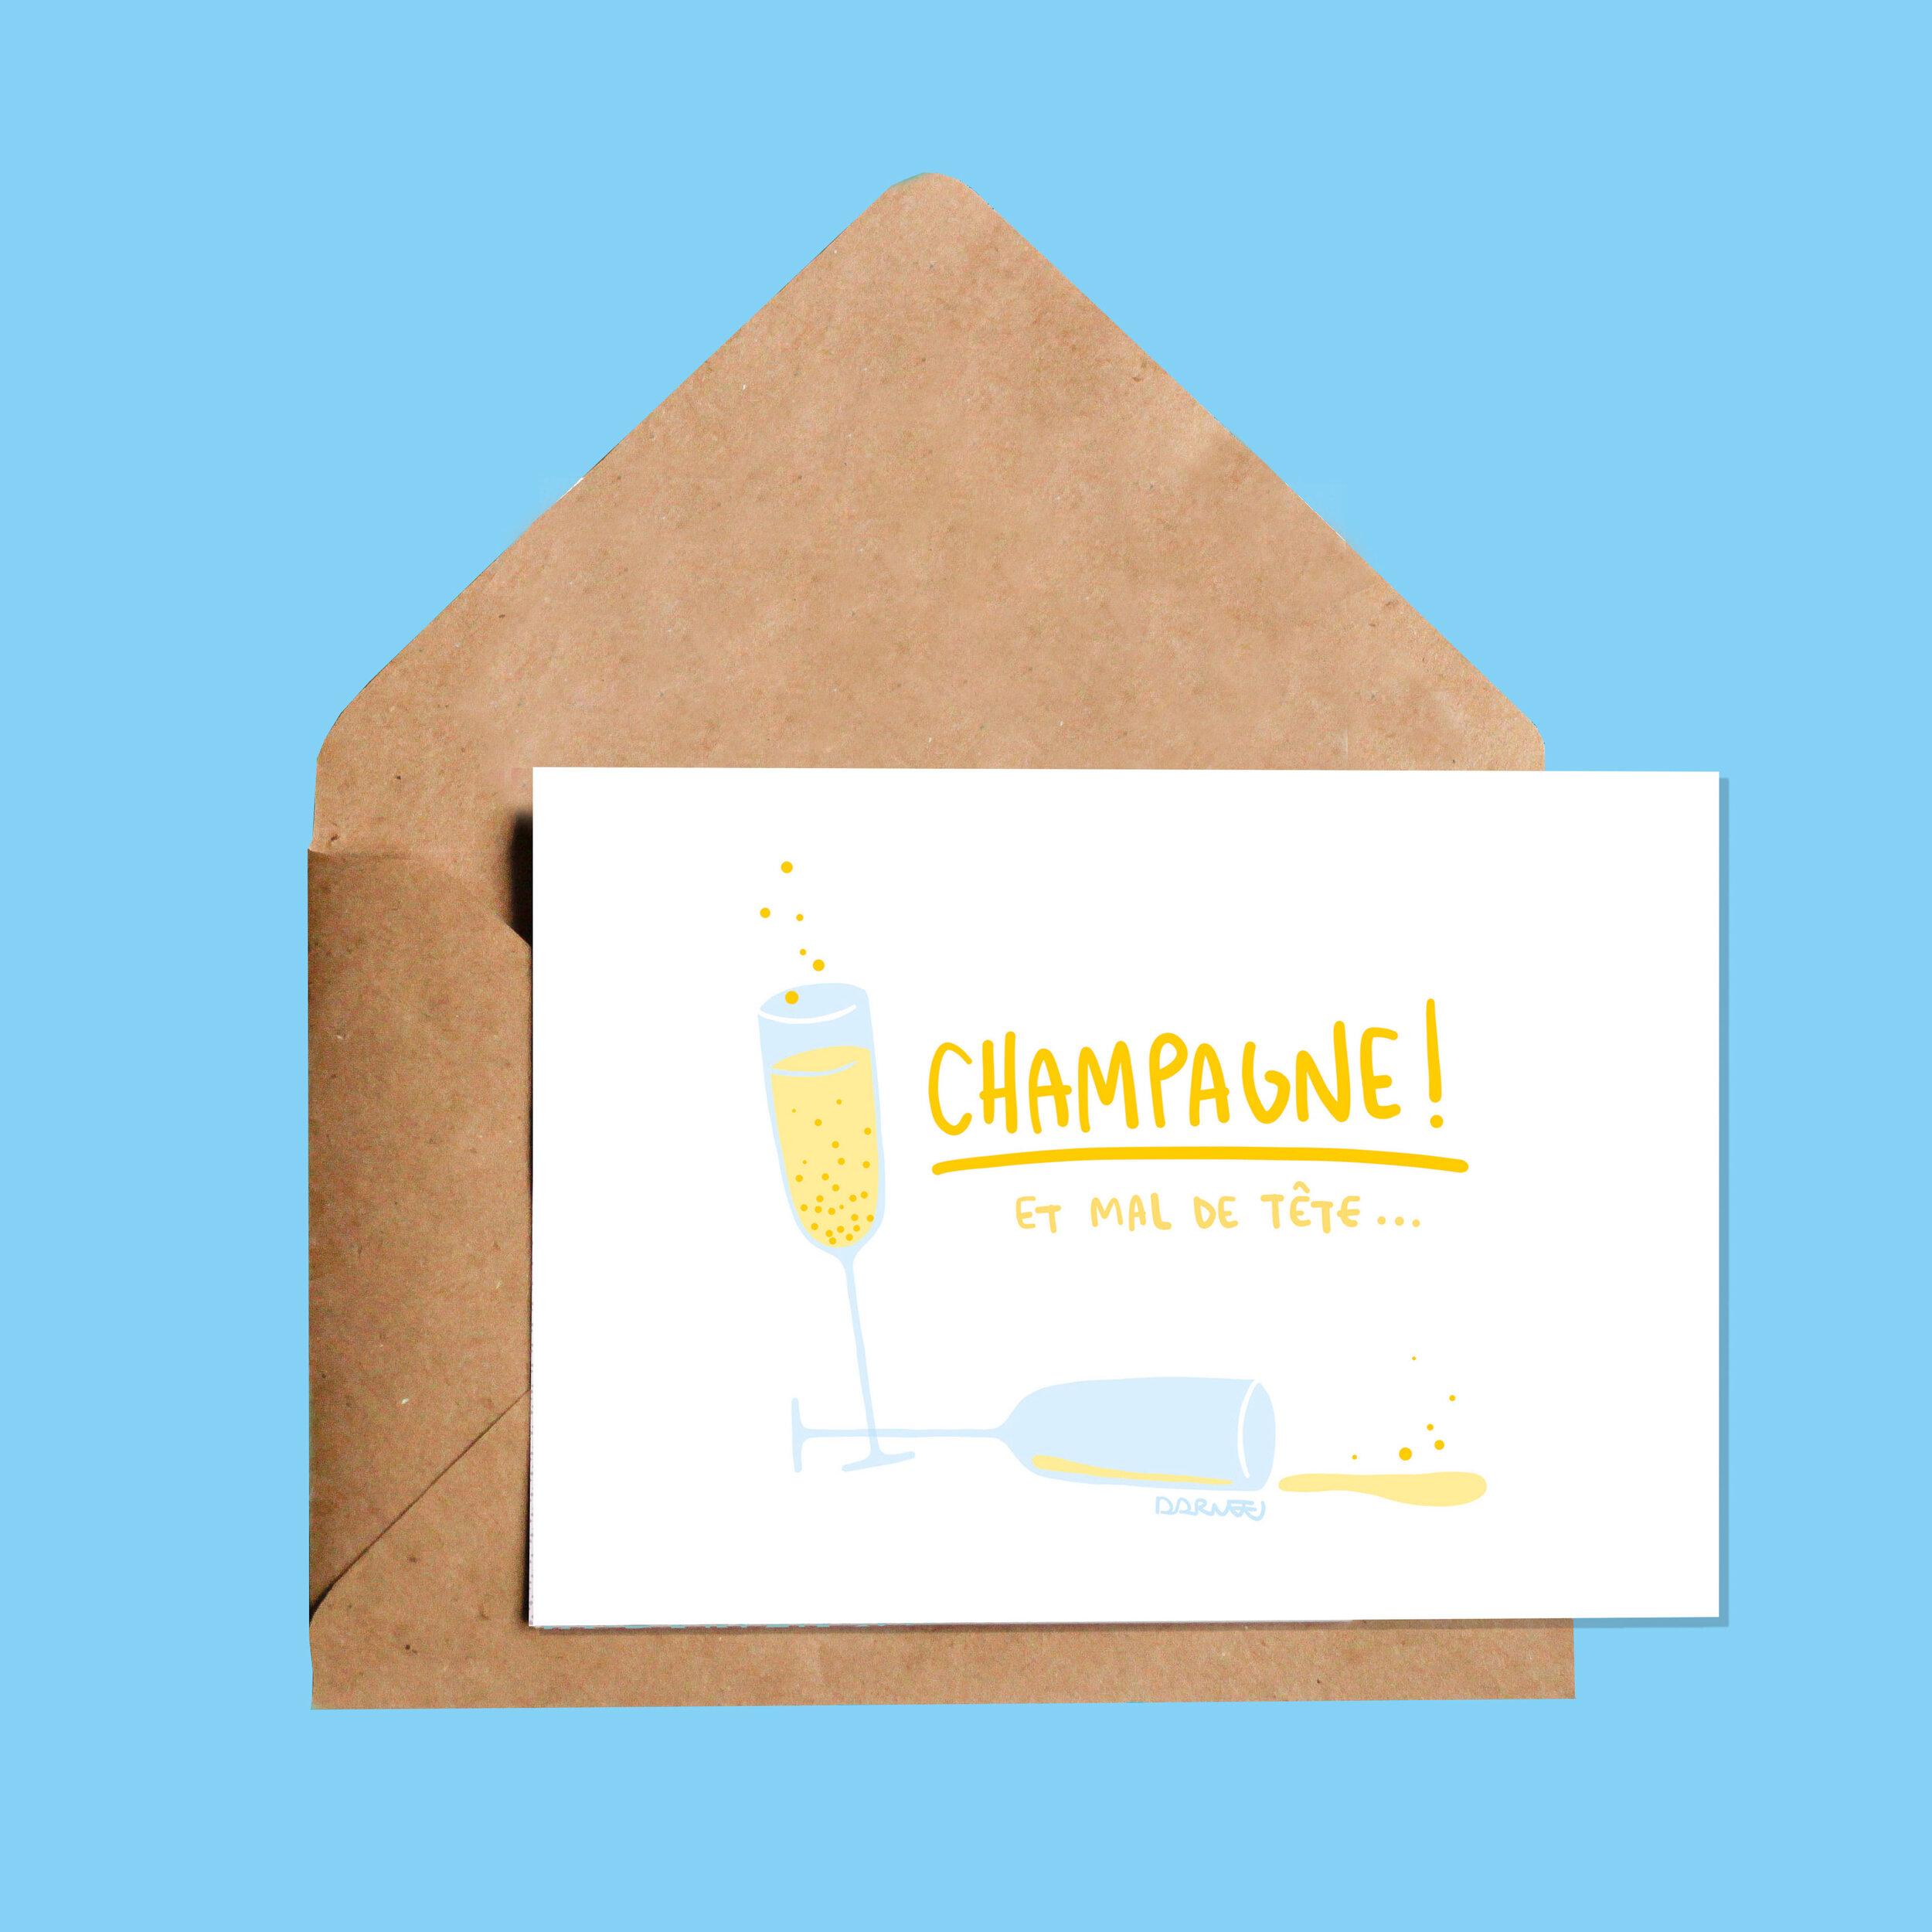 Darvee   Champagne! Et mal de tête…